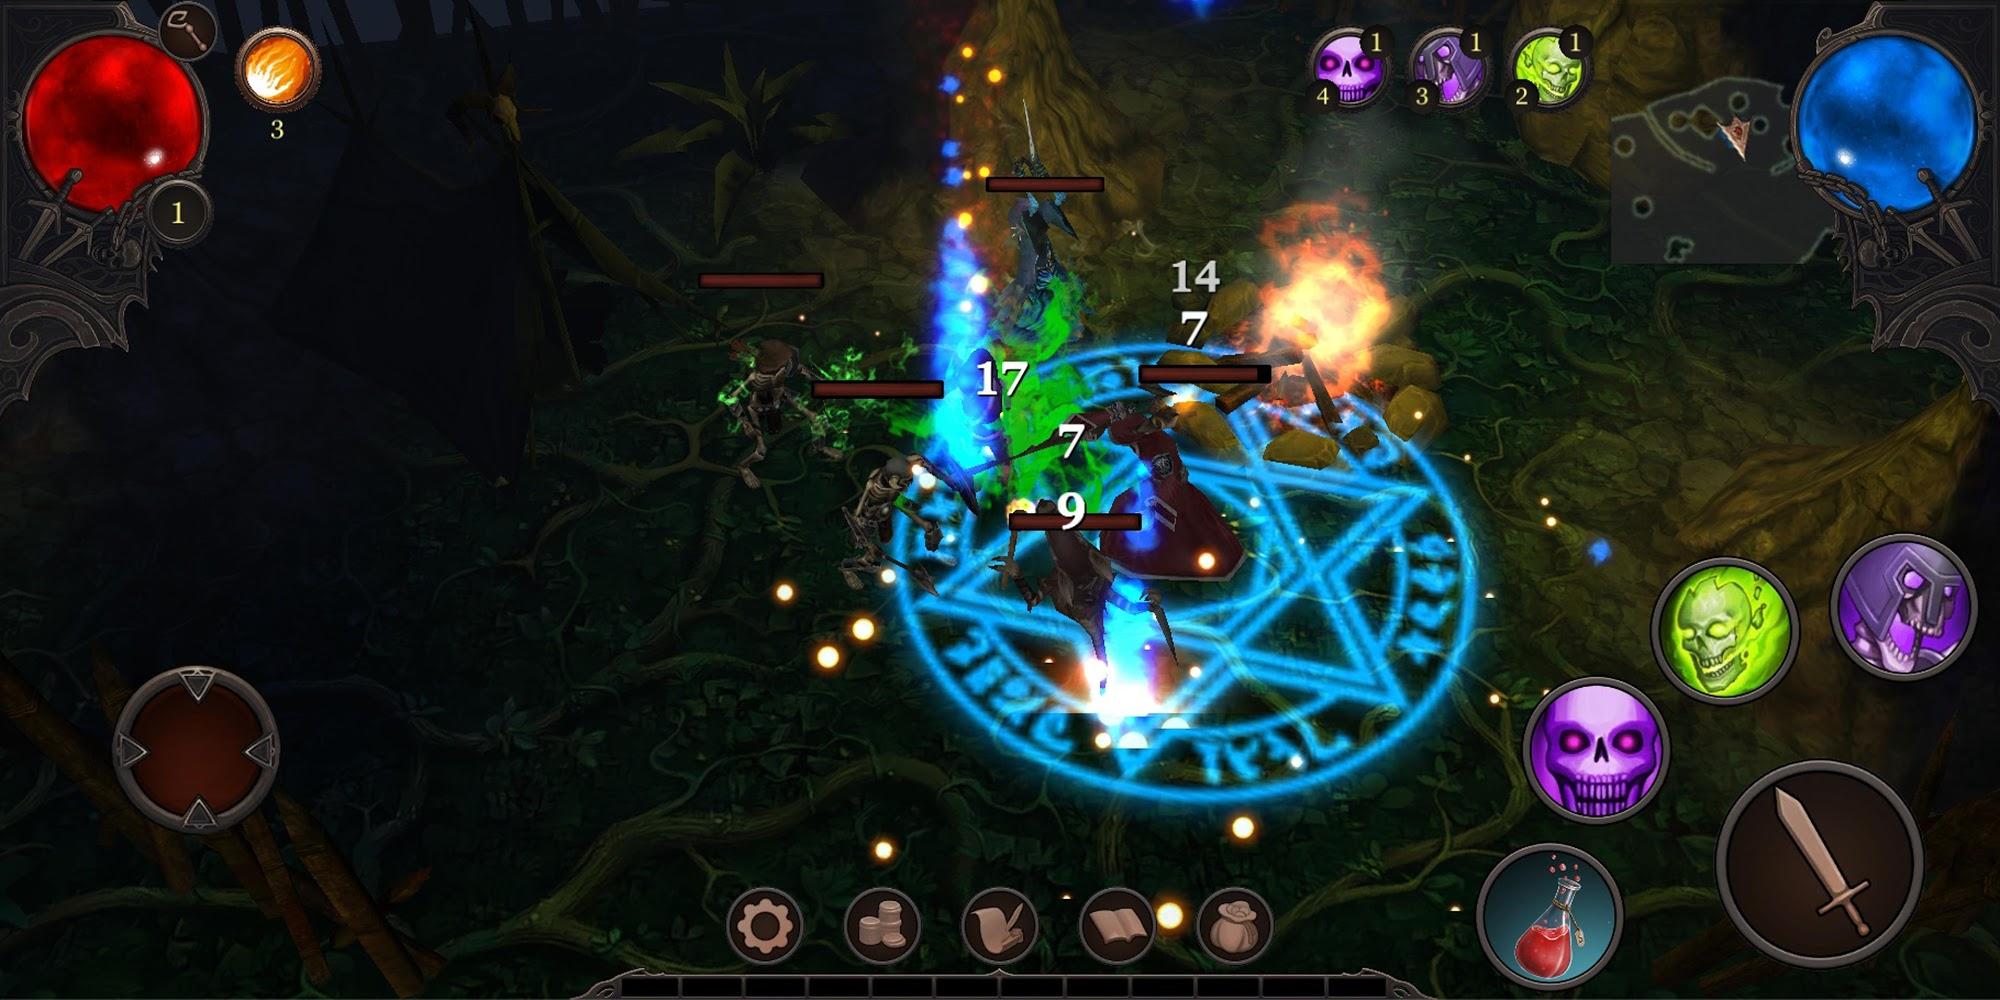 Vengeance captura de pantalla 1